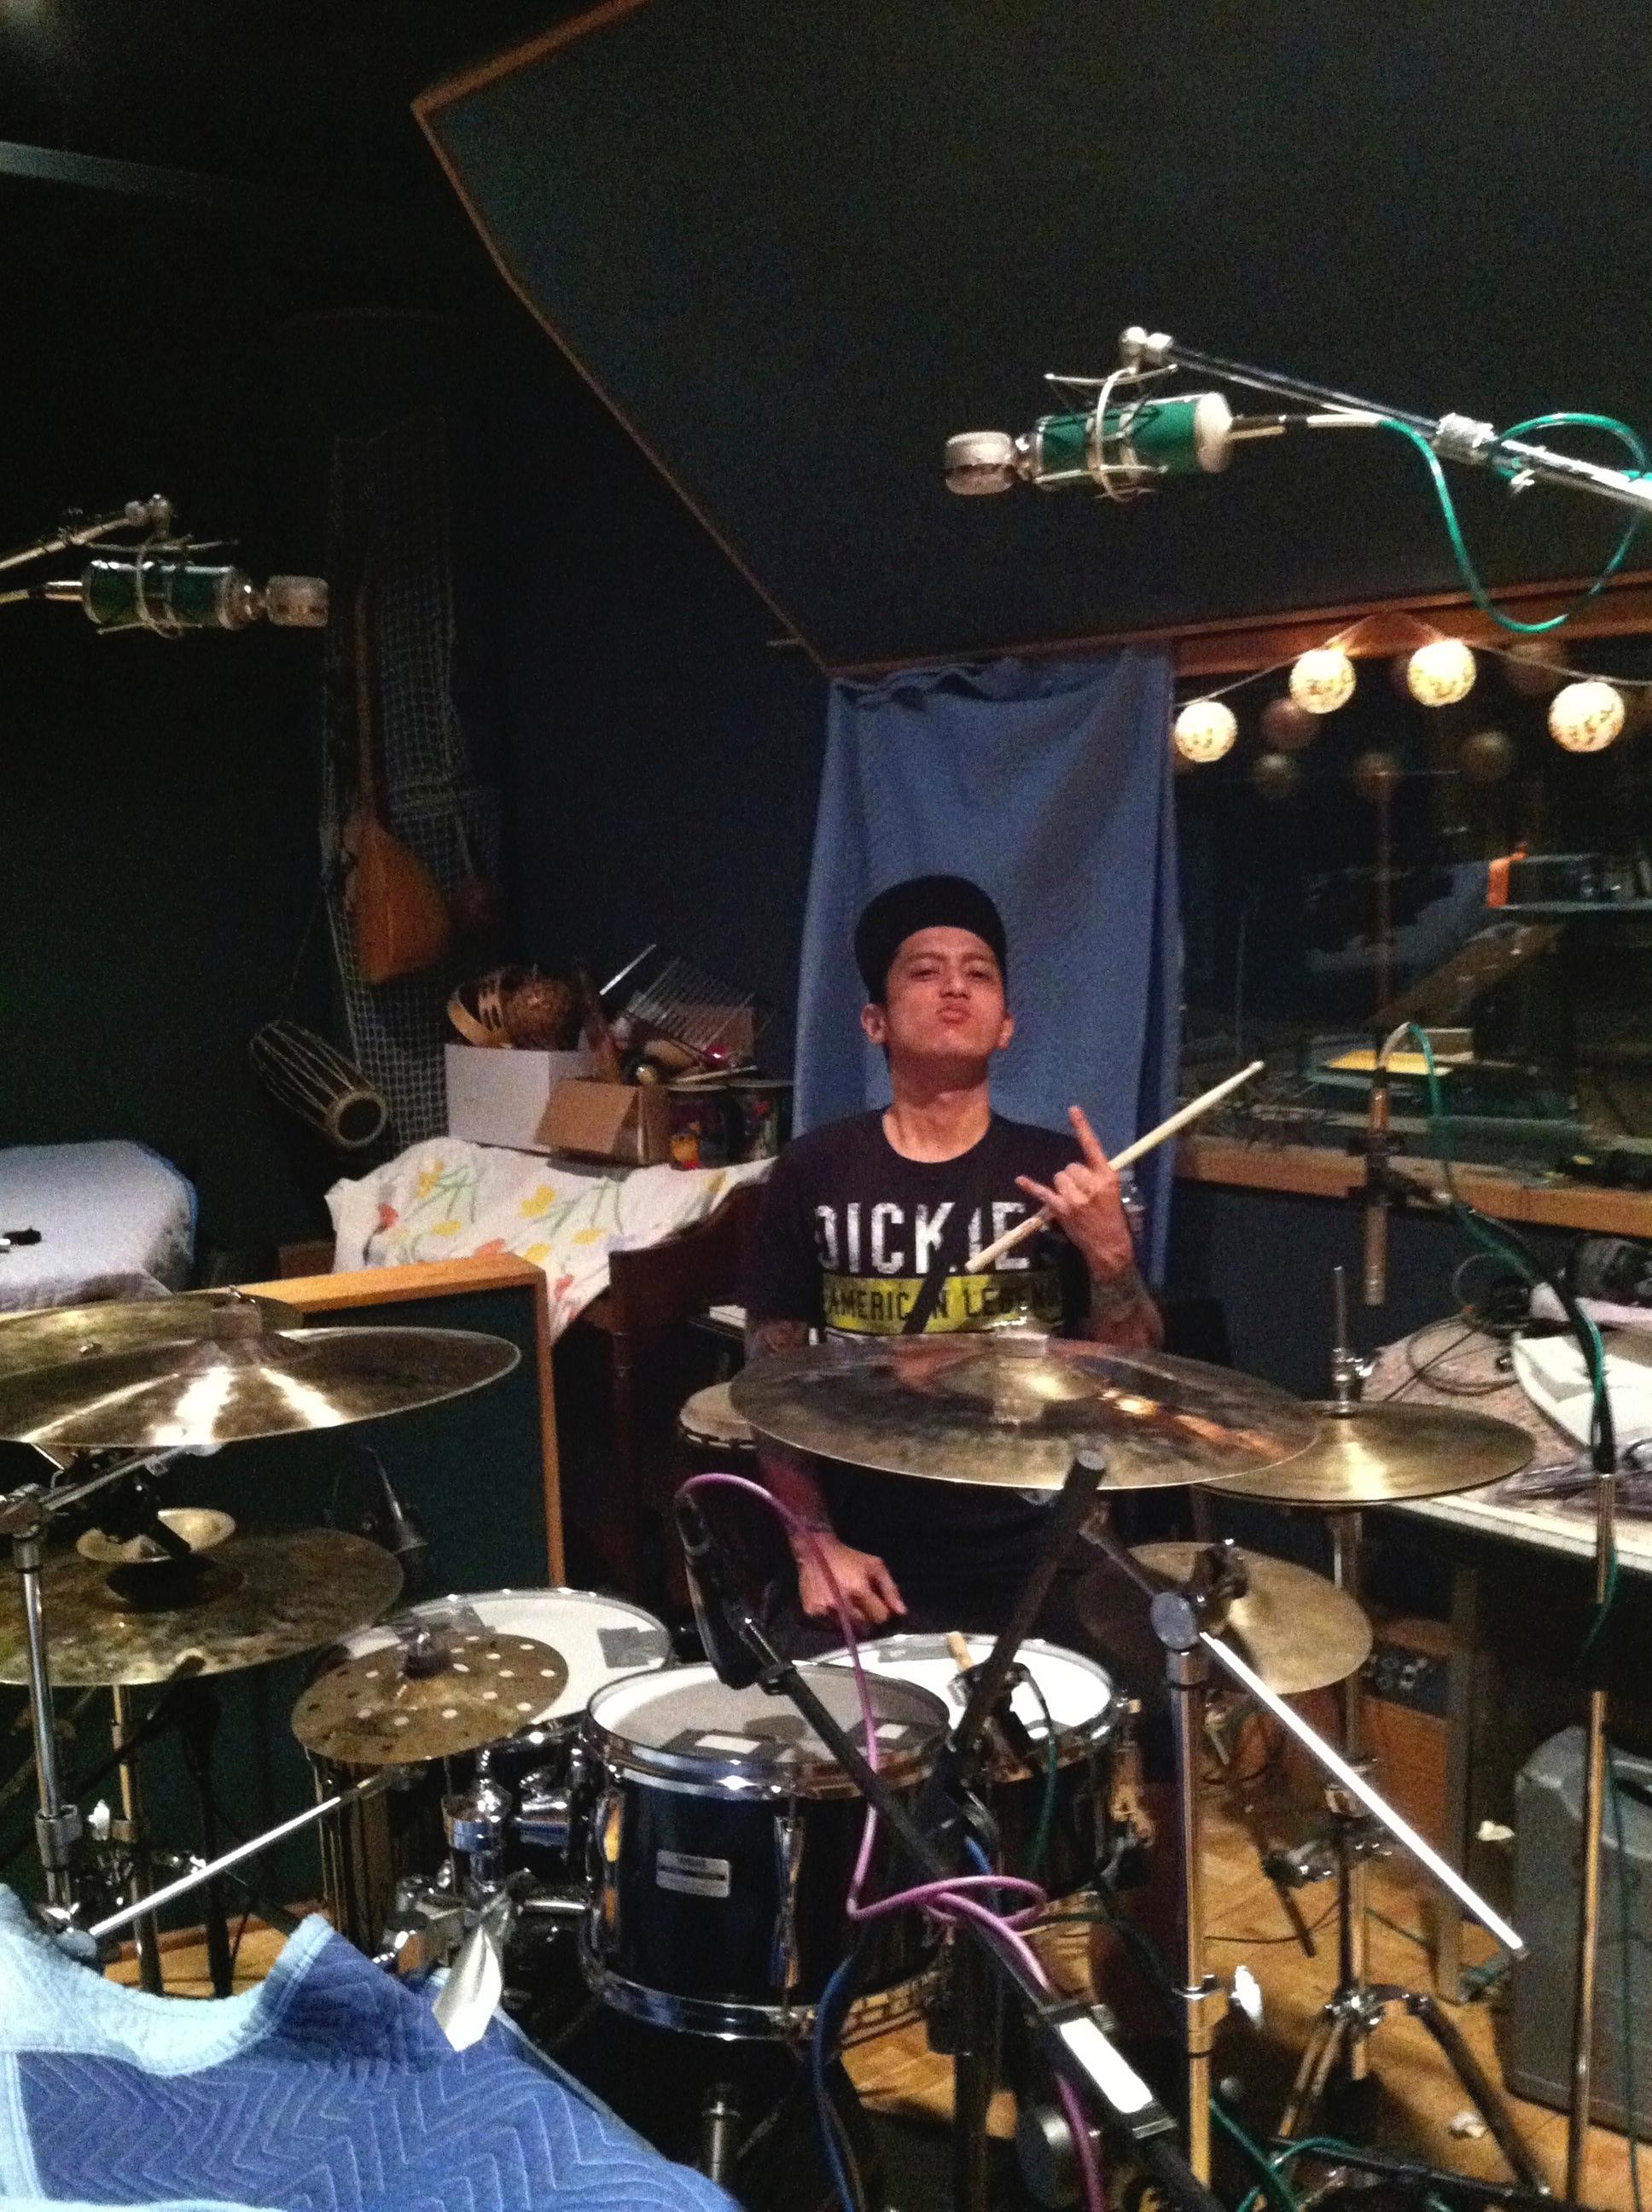 Slapshock's drummer Chi Avora behind the kit